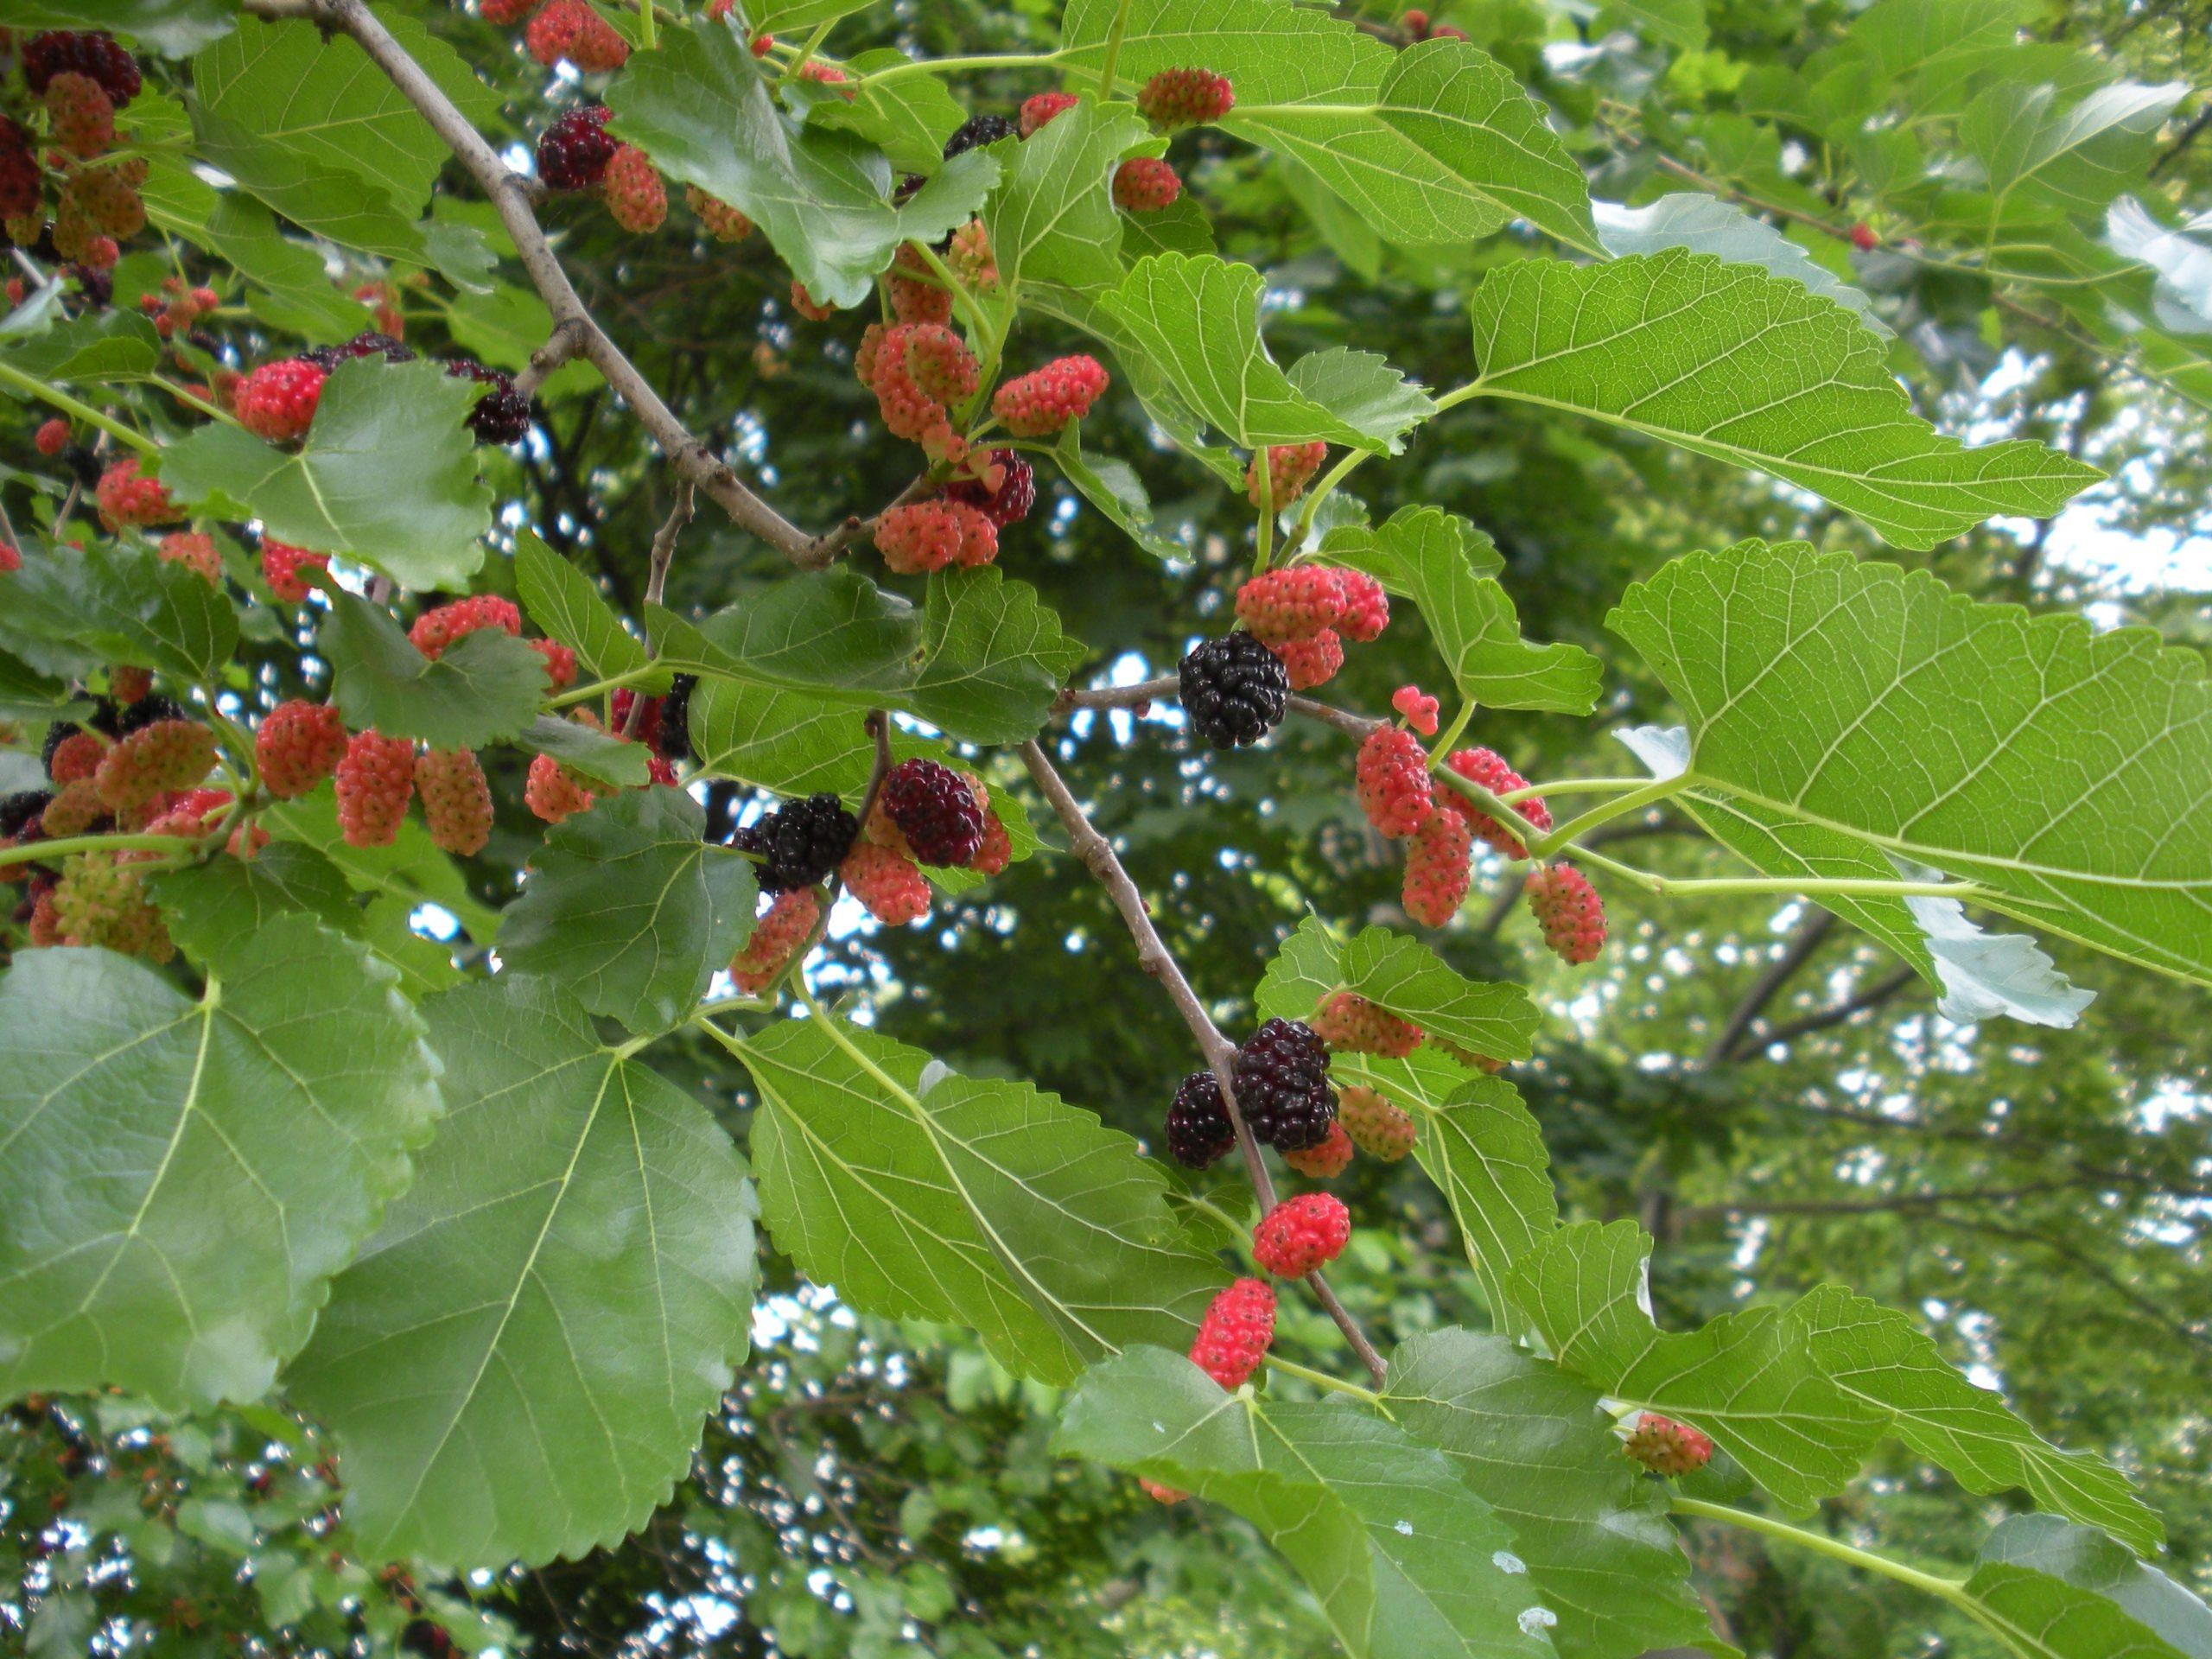 white mulberry fruit - identification